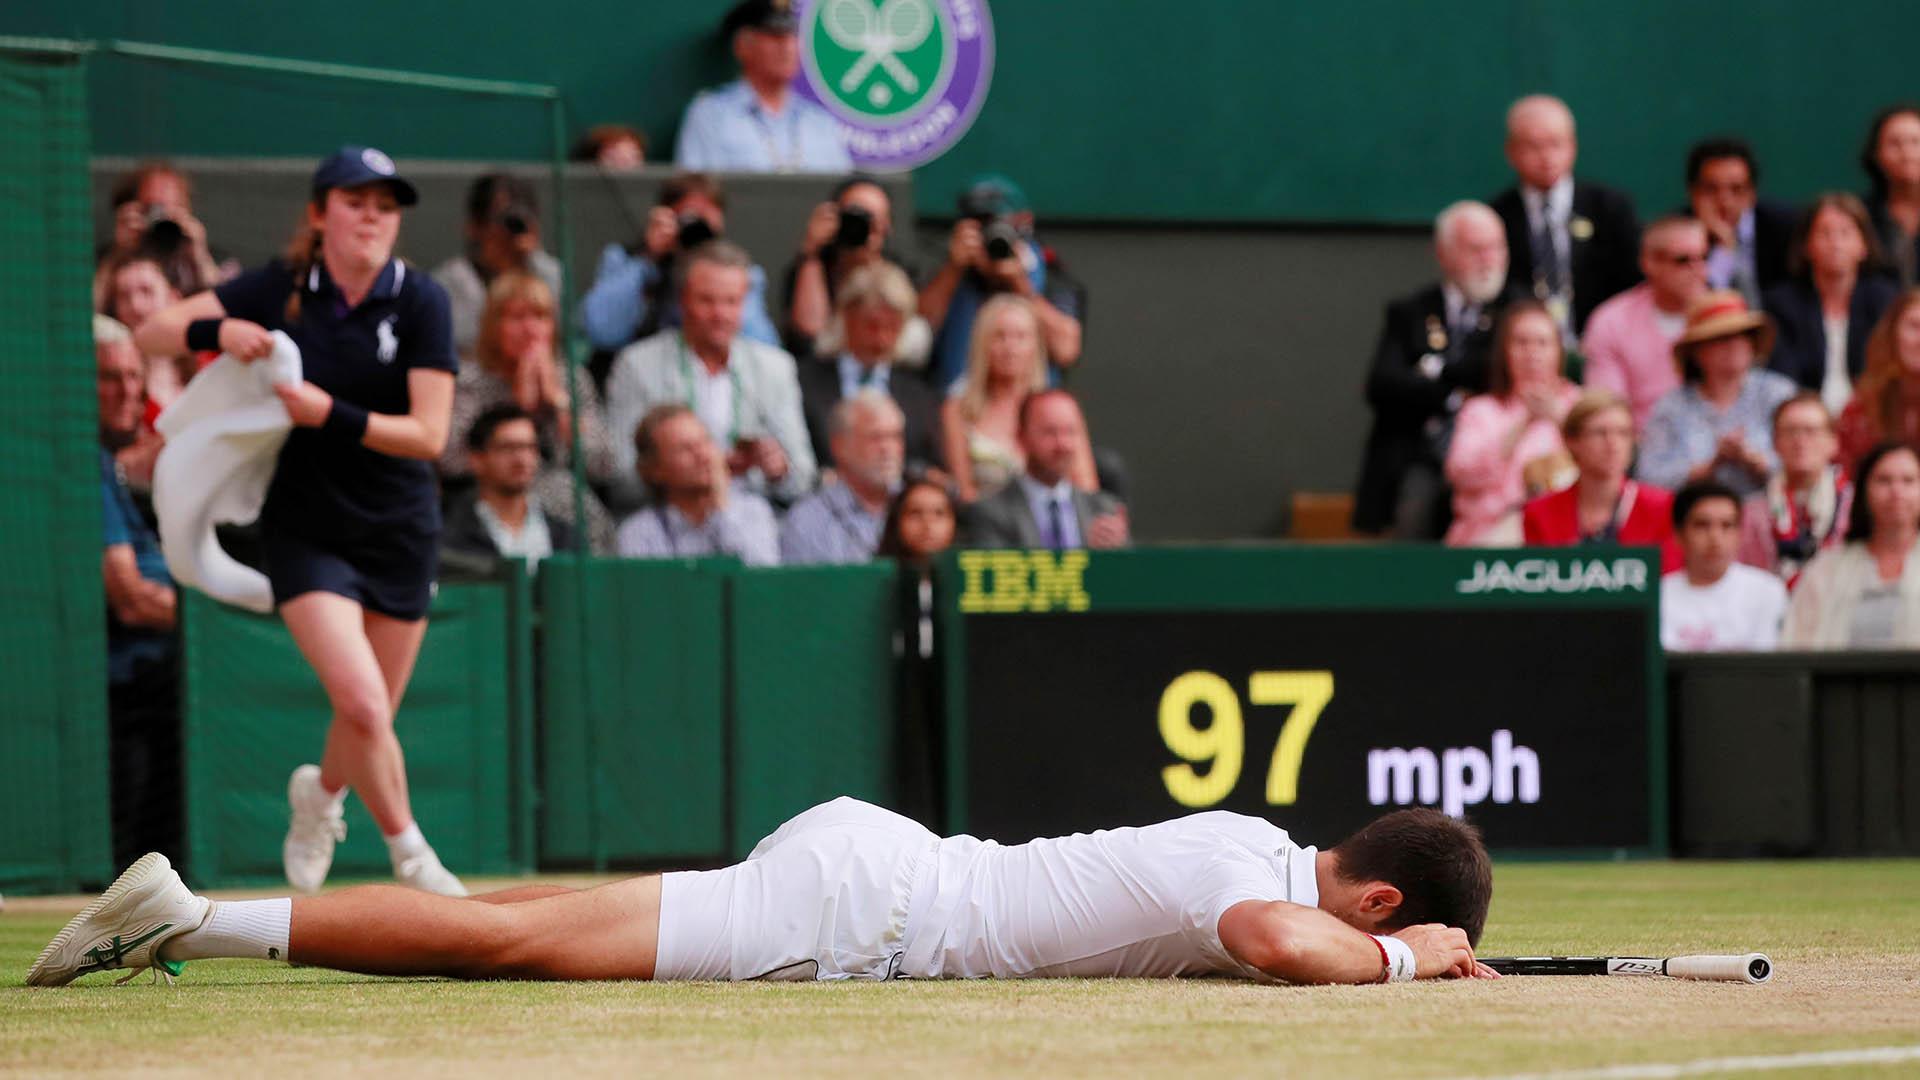 Djokovic supera por 26-22 a Federer en el historia entre ambos (REUTERS)